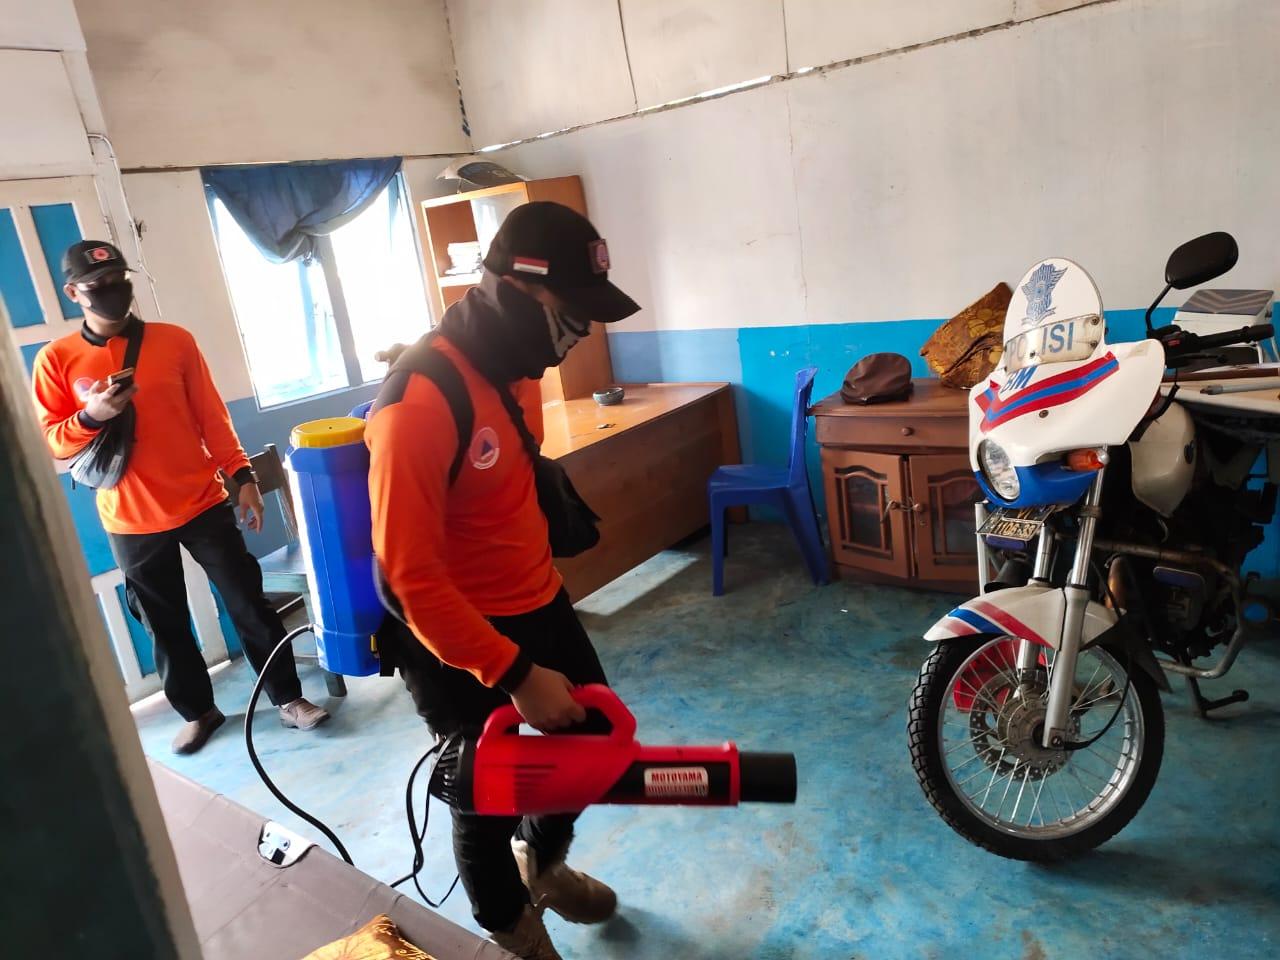 Cegah Corona, Pos Pam Ops Ketupat 2020 Disemprot Disinfektan